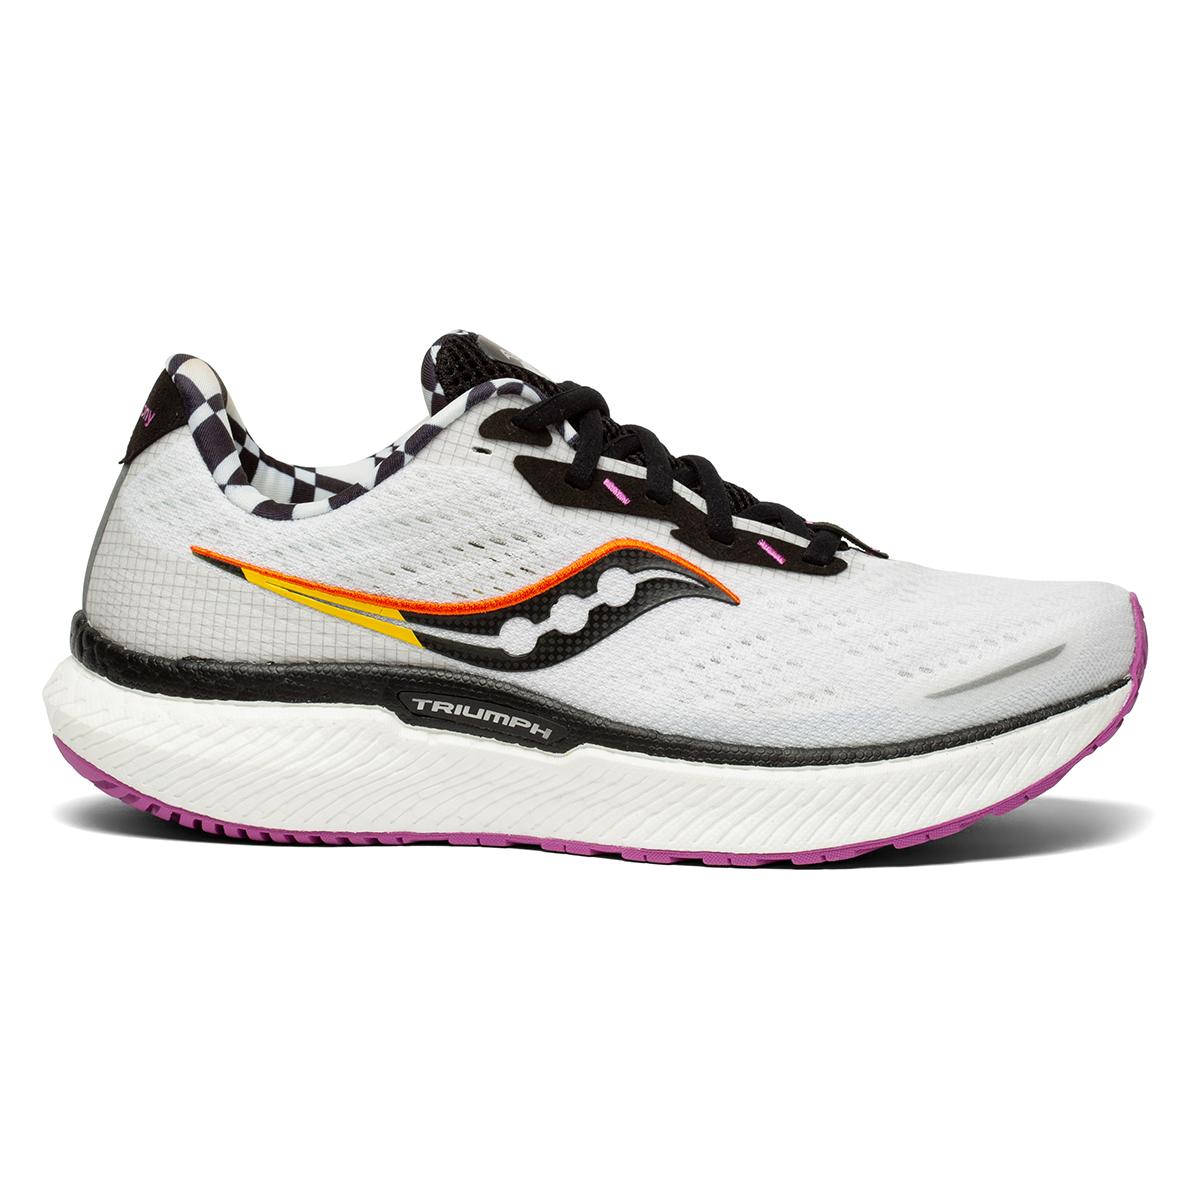 Women's Saucony Triumph 19 Running Shoe, , large, image 1